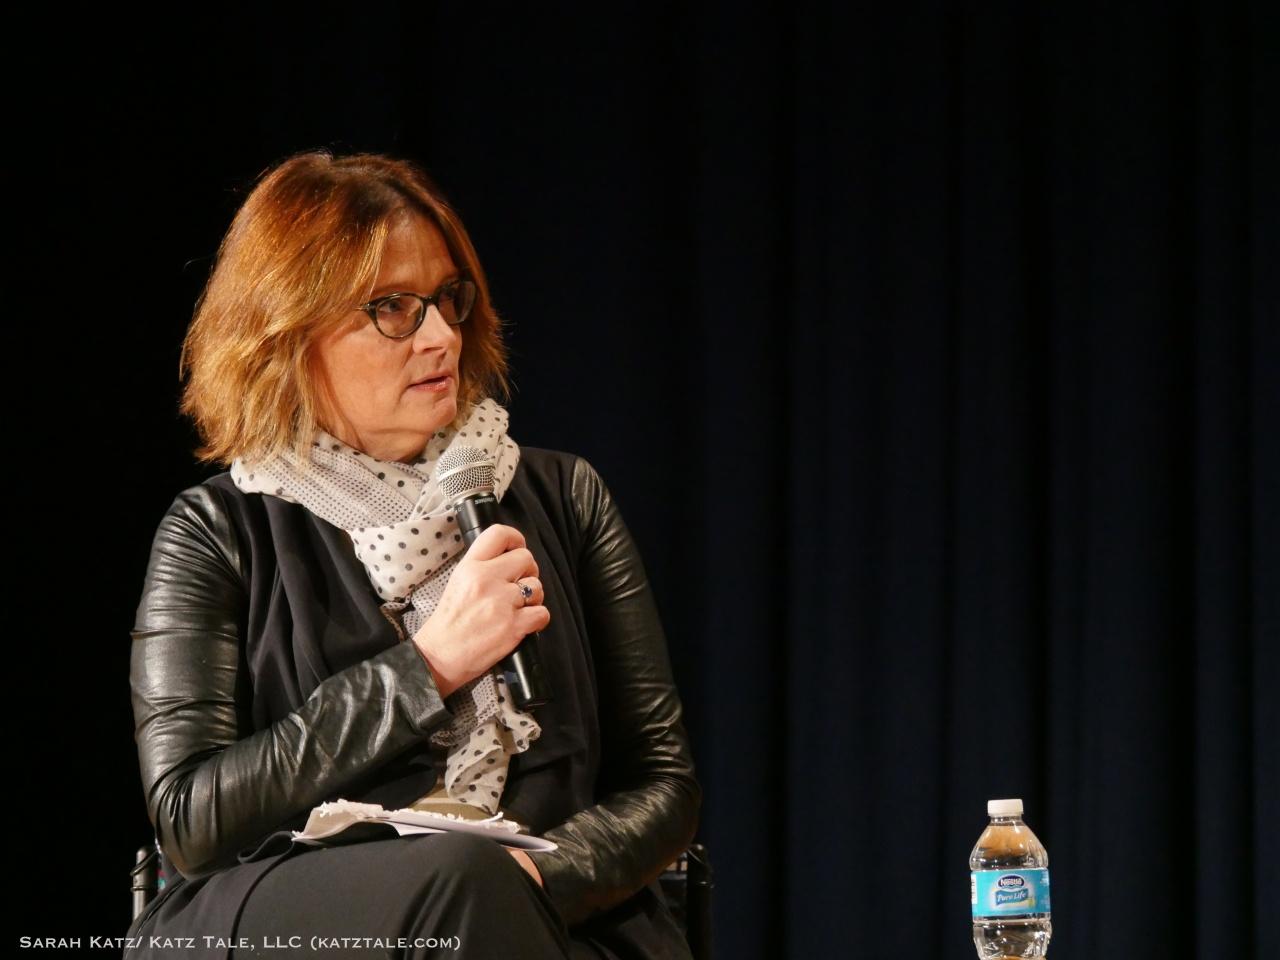 Ann Hornaday of the Washington Post